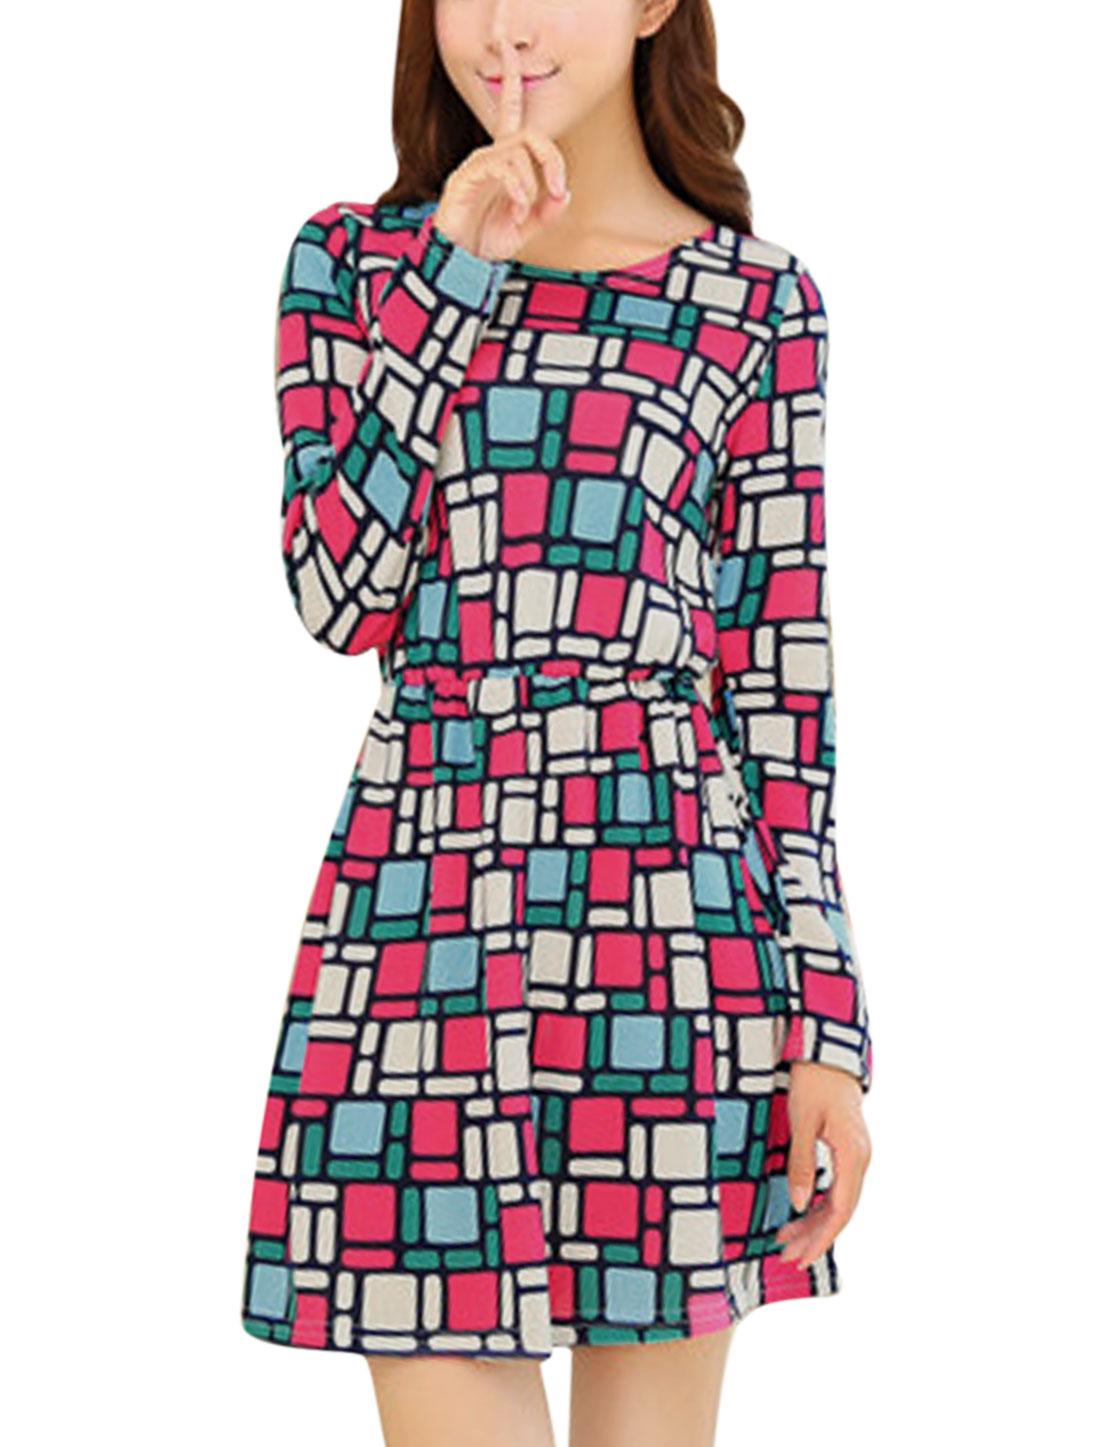 Lady Geometric Prints Long Sleeve Knit A Line Dress Fuchsia Beige XS